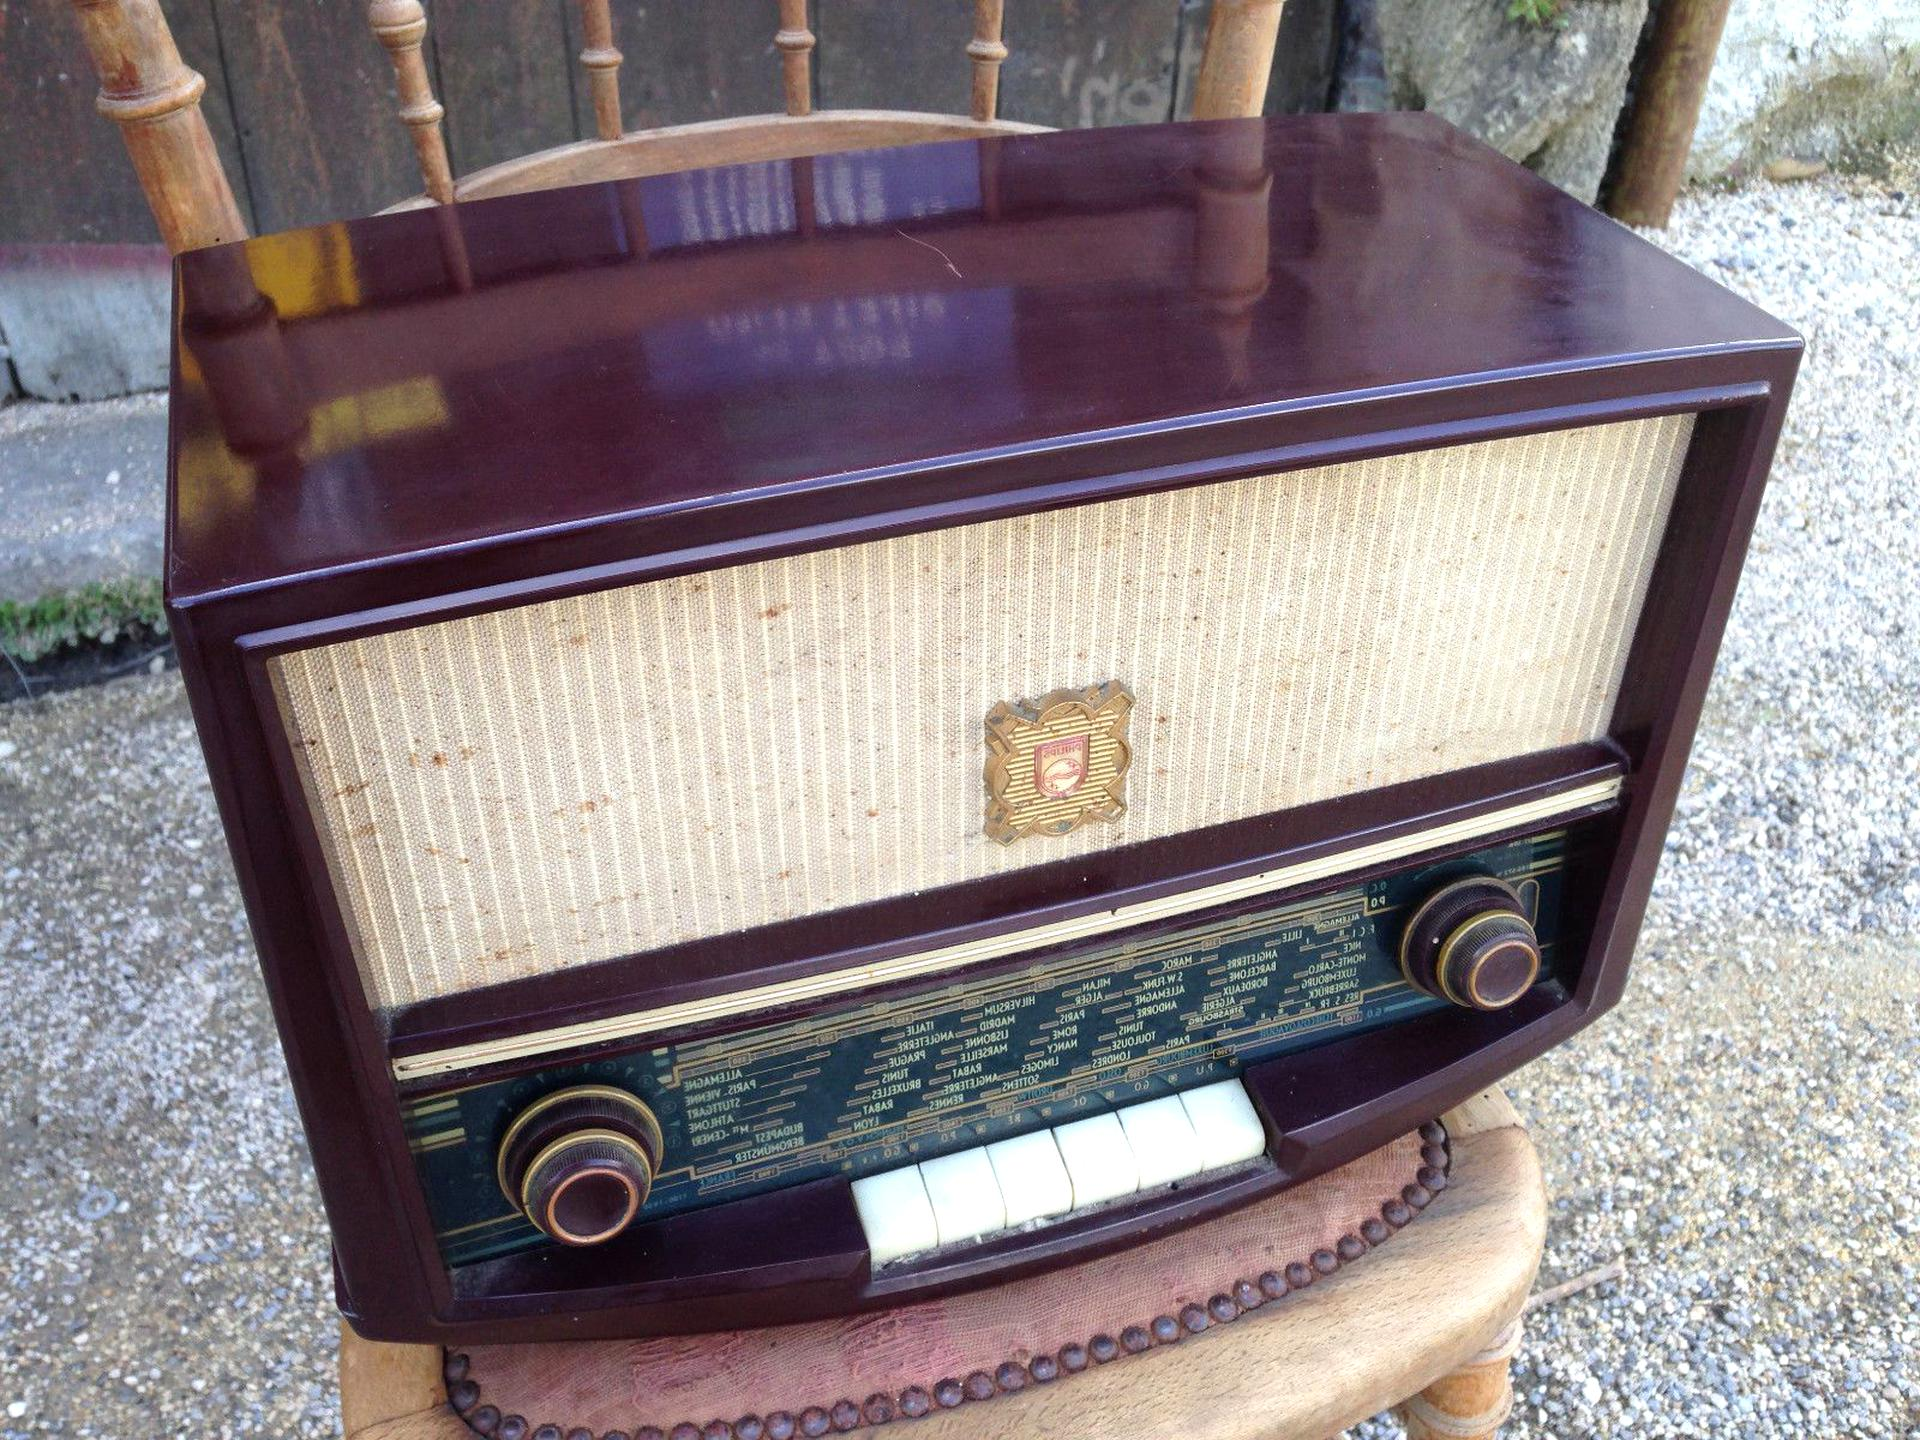 poste radio lampes radio tsf d'occasion